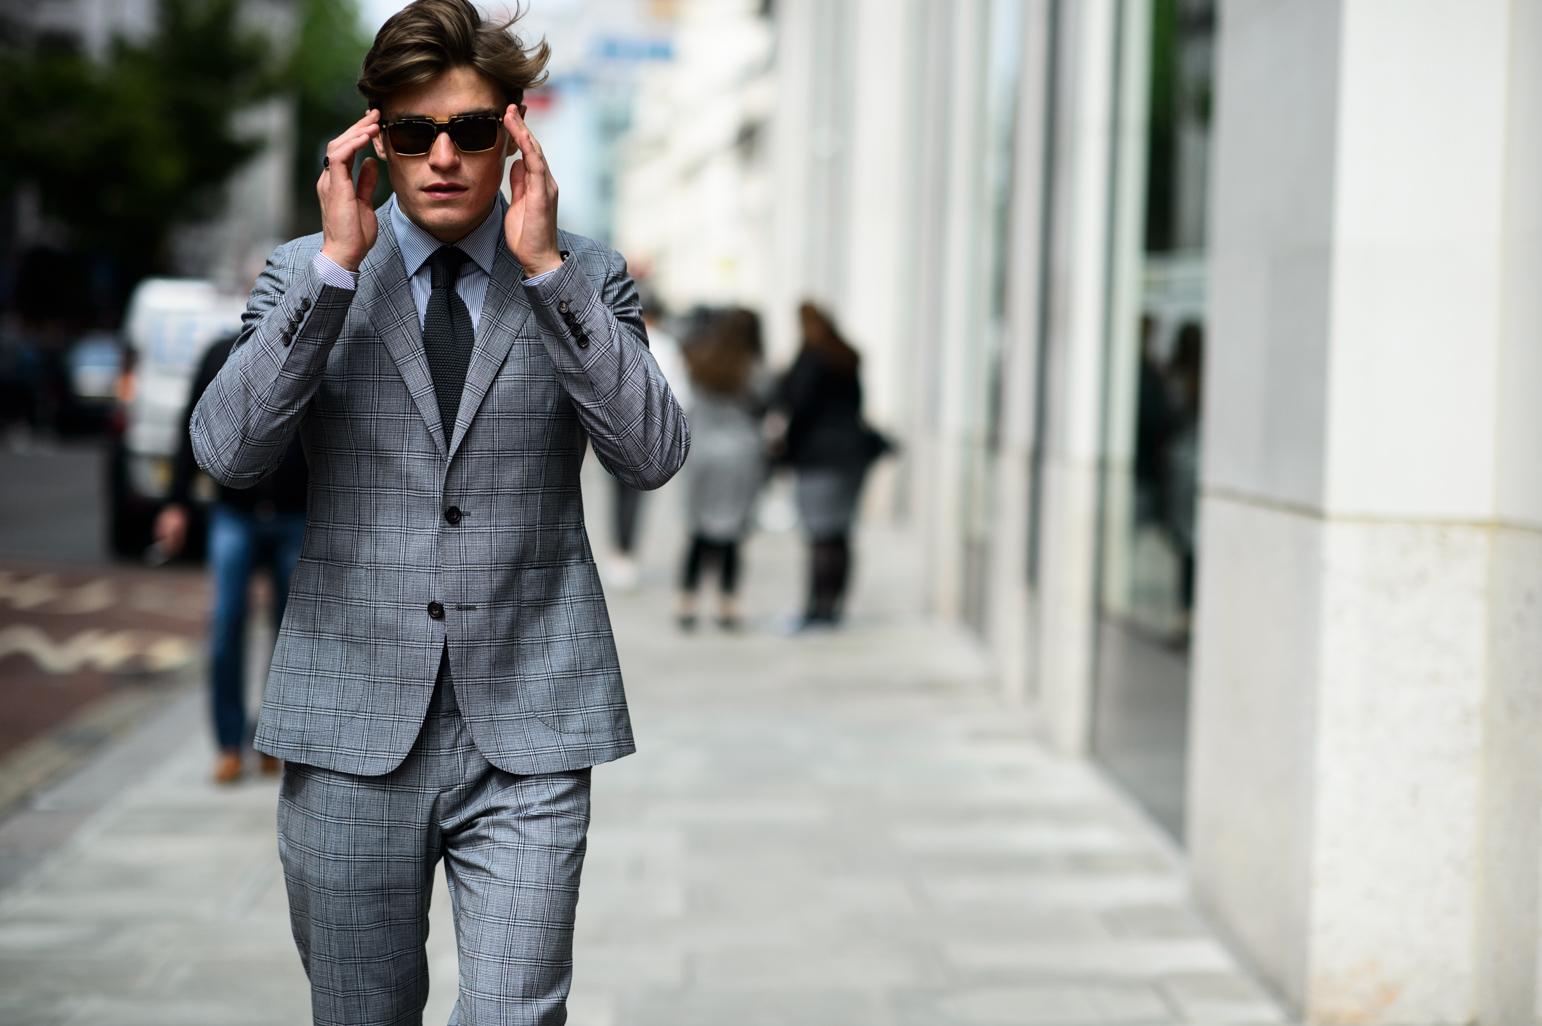 The Men S Fashion Rules Fashion Beauty